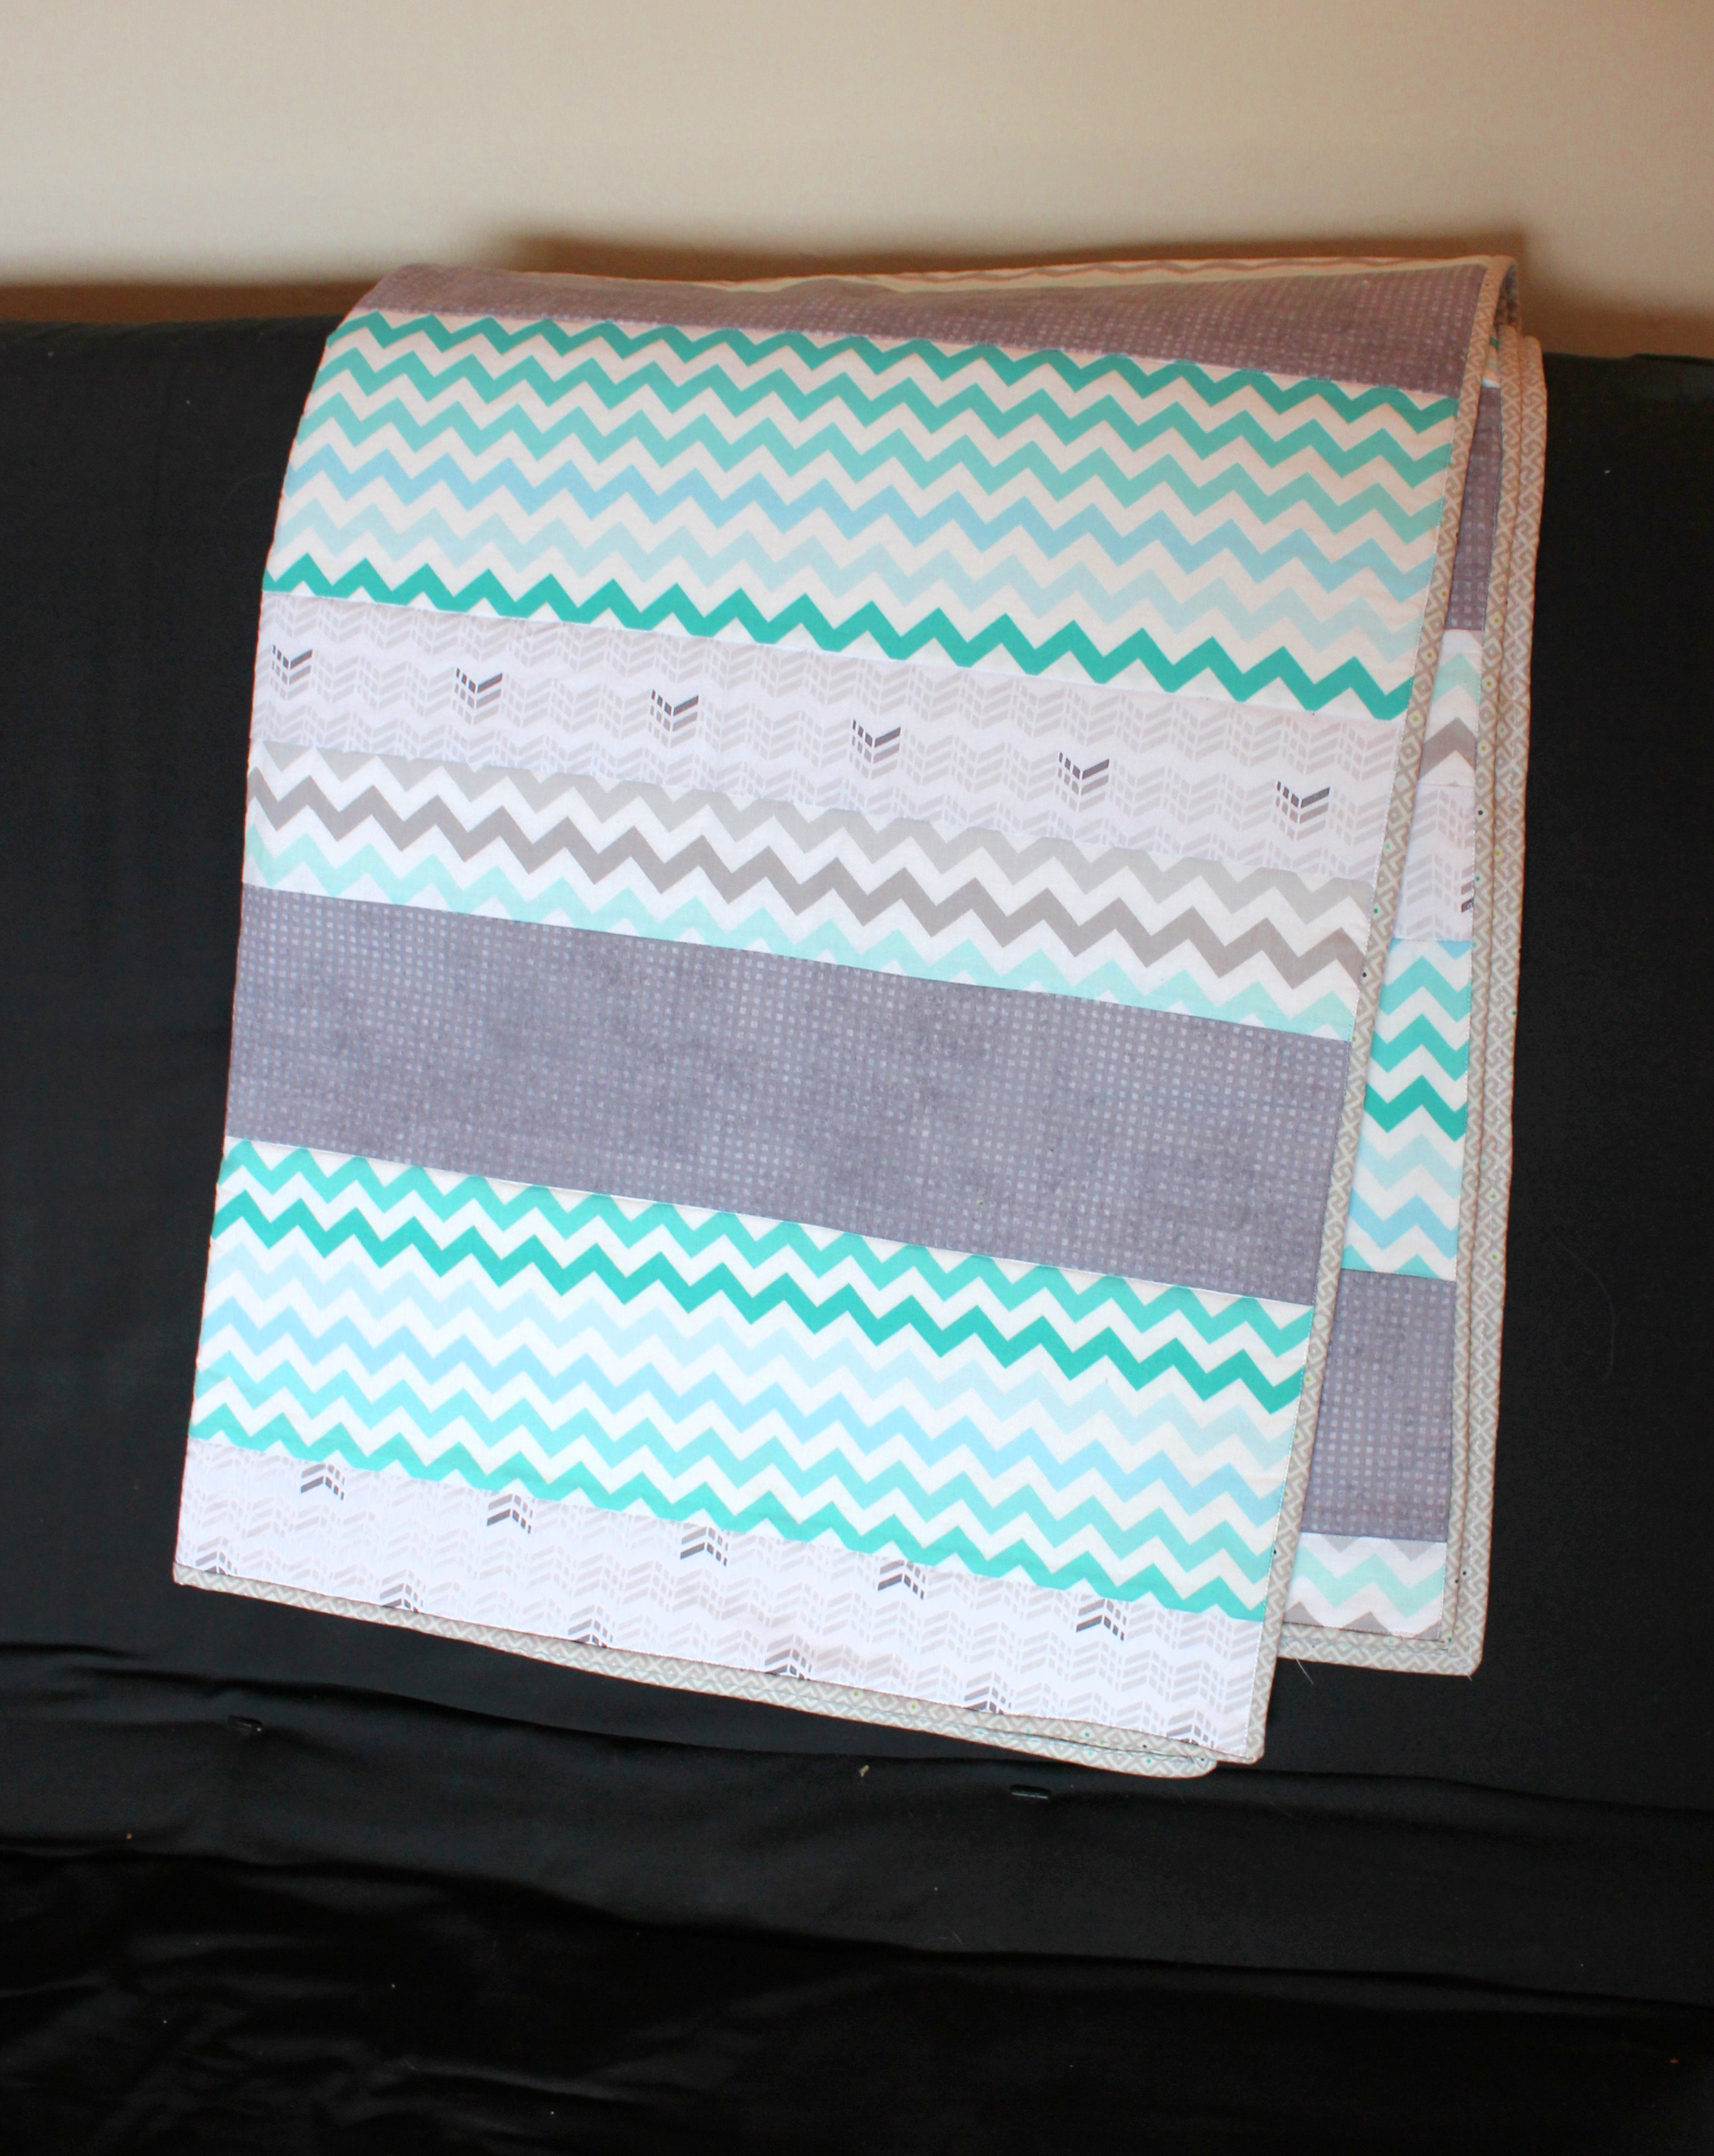 teal grey baby quilt midwest coast sewist. Black Bedroom Furniture Sets. Home Design Ideas